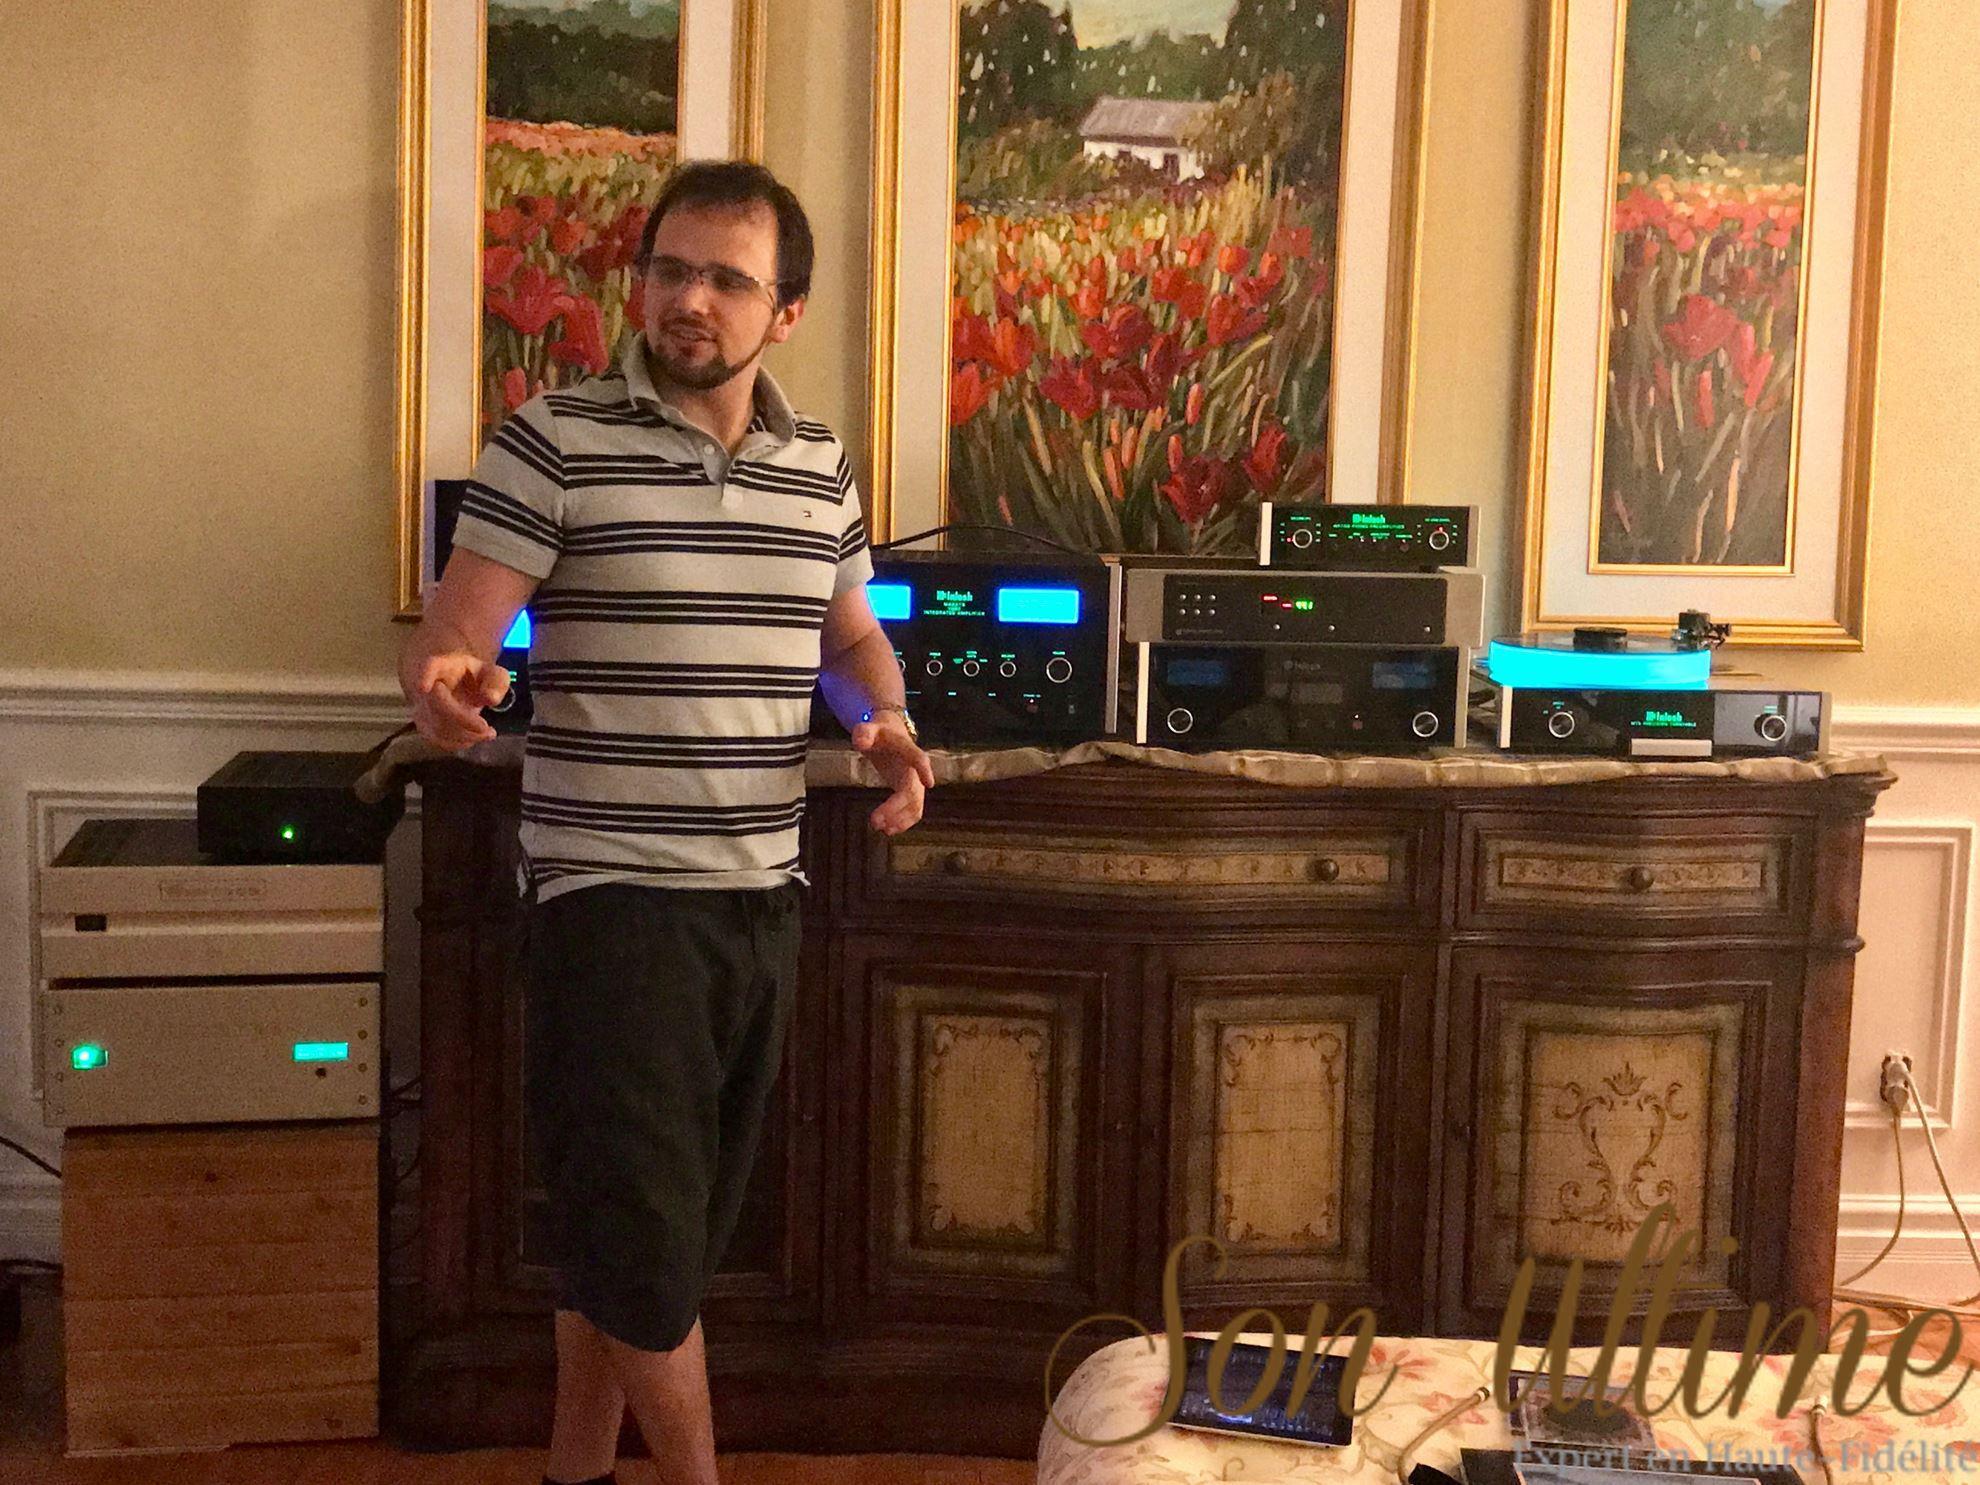 Soirée Audiophile #4 : Transfos, DAC et Table tournante